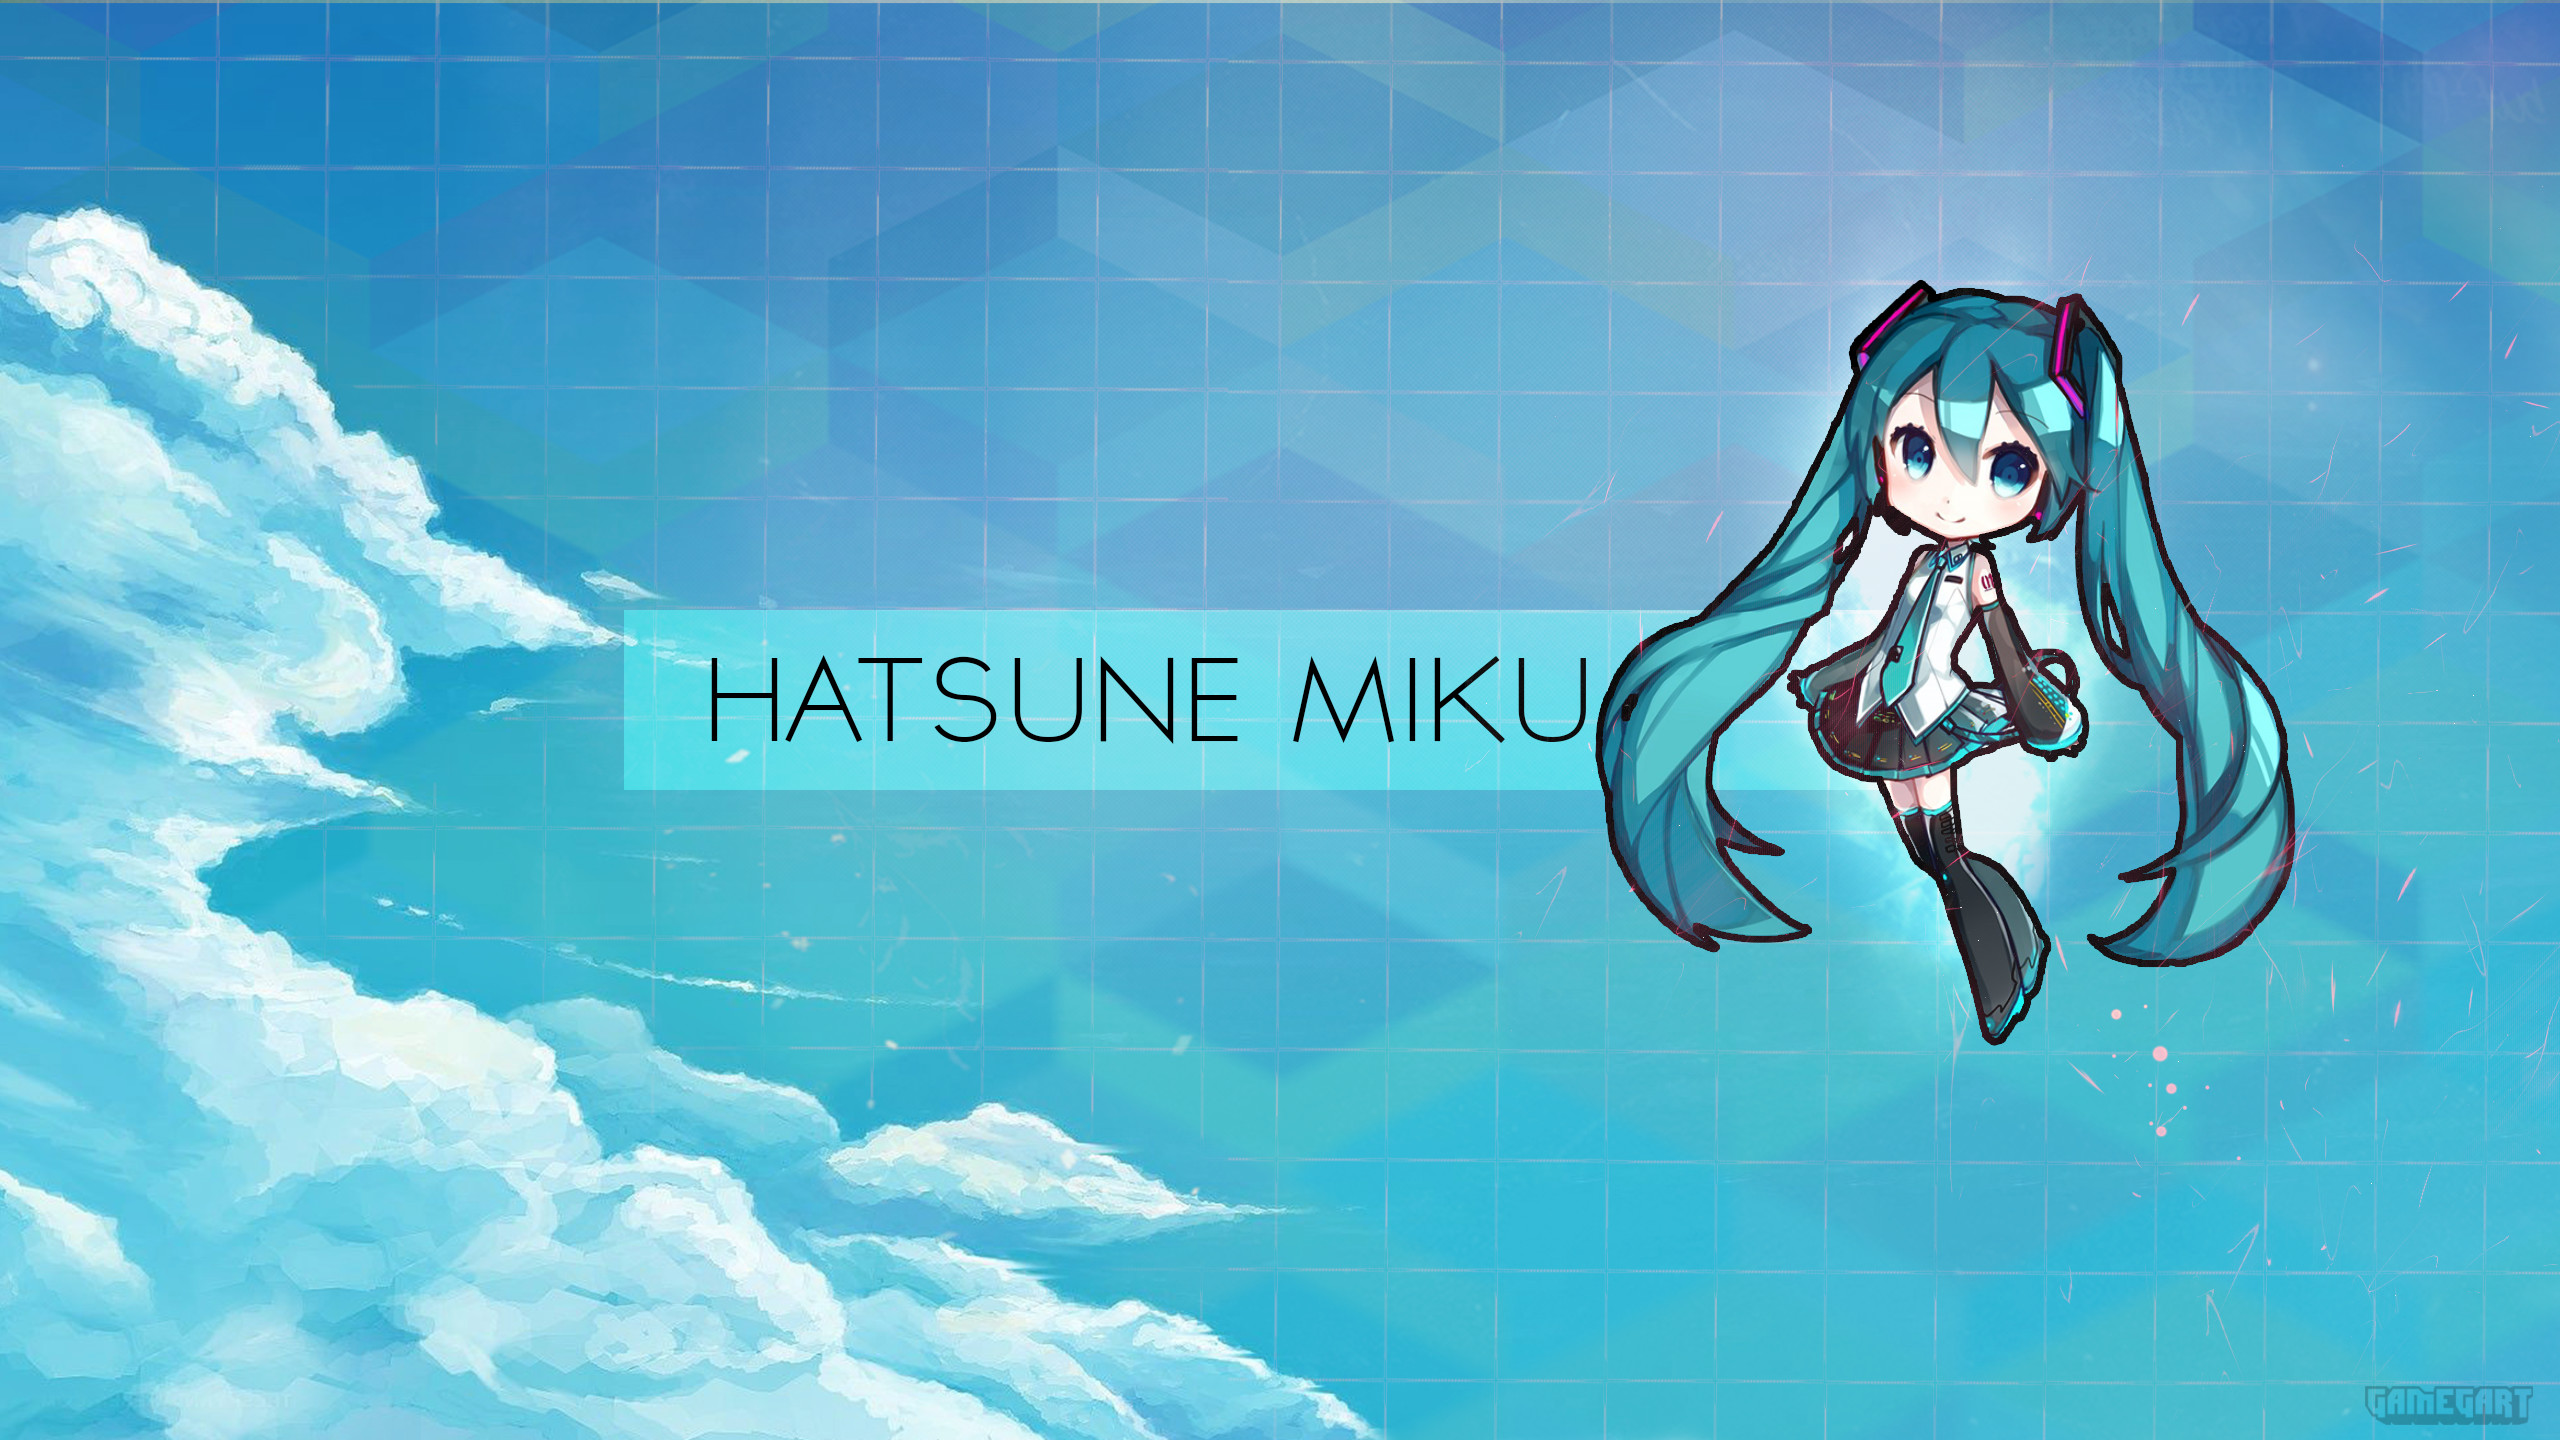 art hd hatsune miku wallpapers